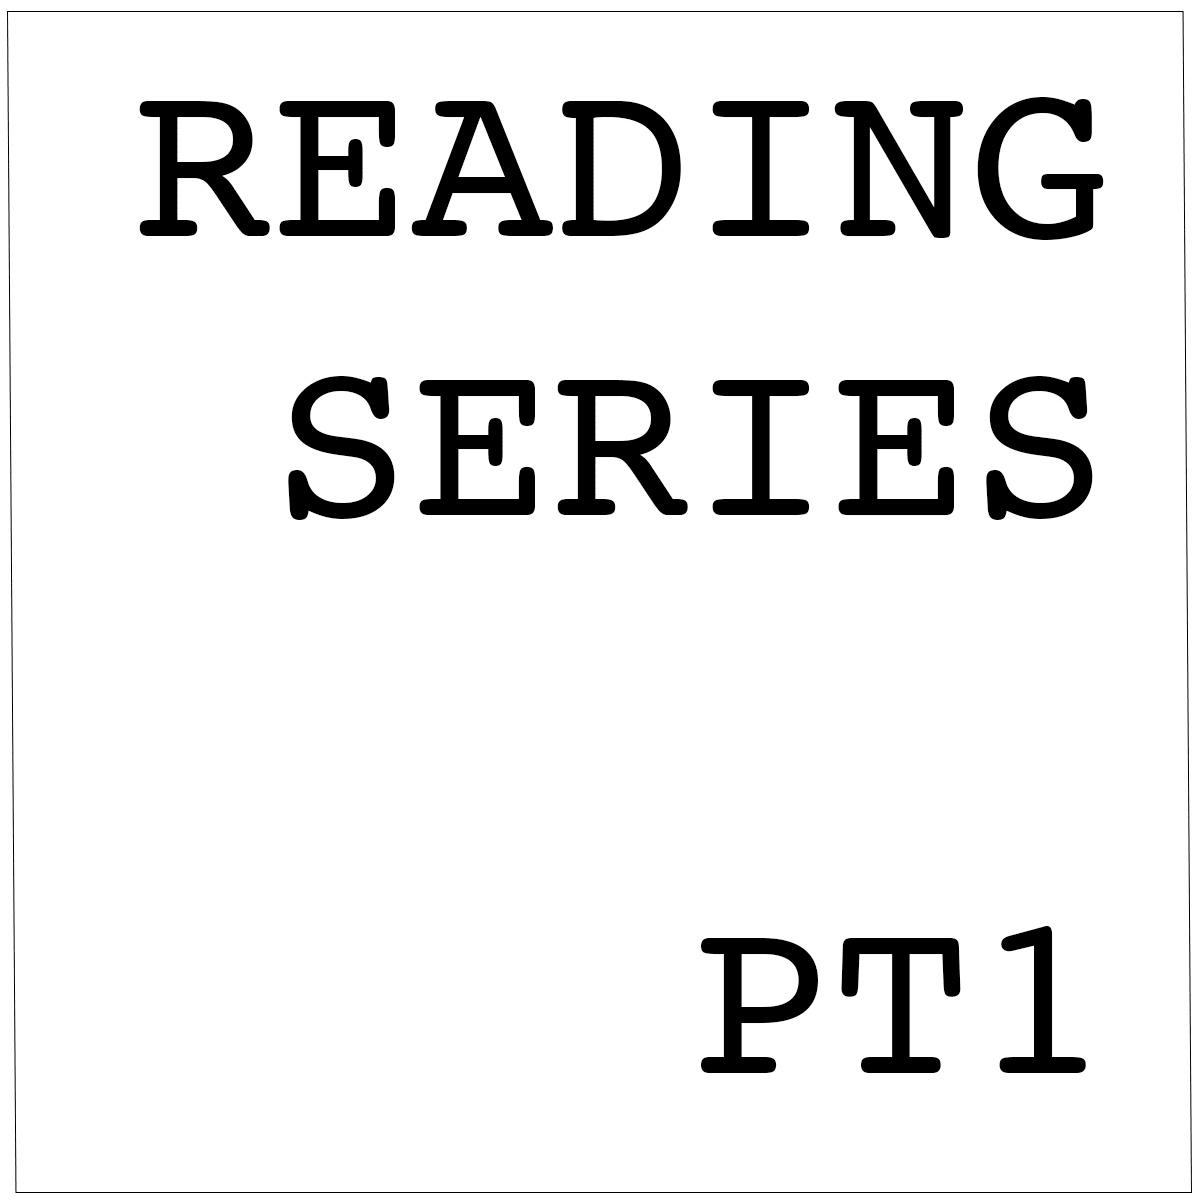 Reading Series Pt. 1